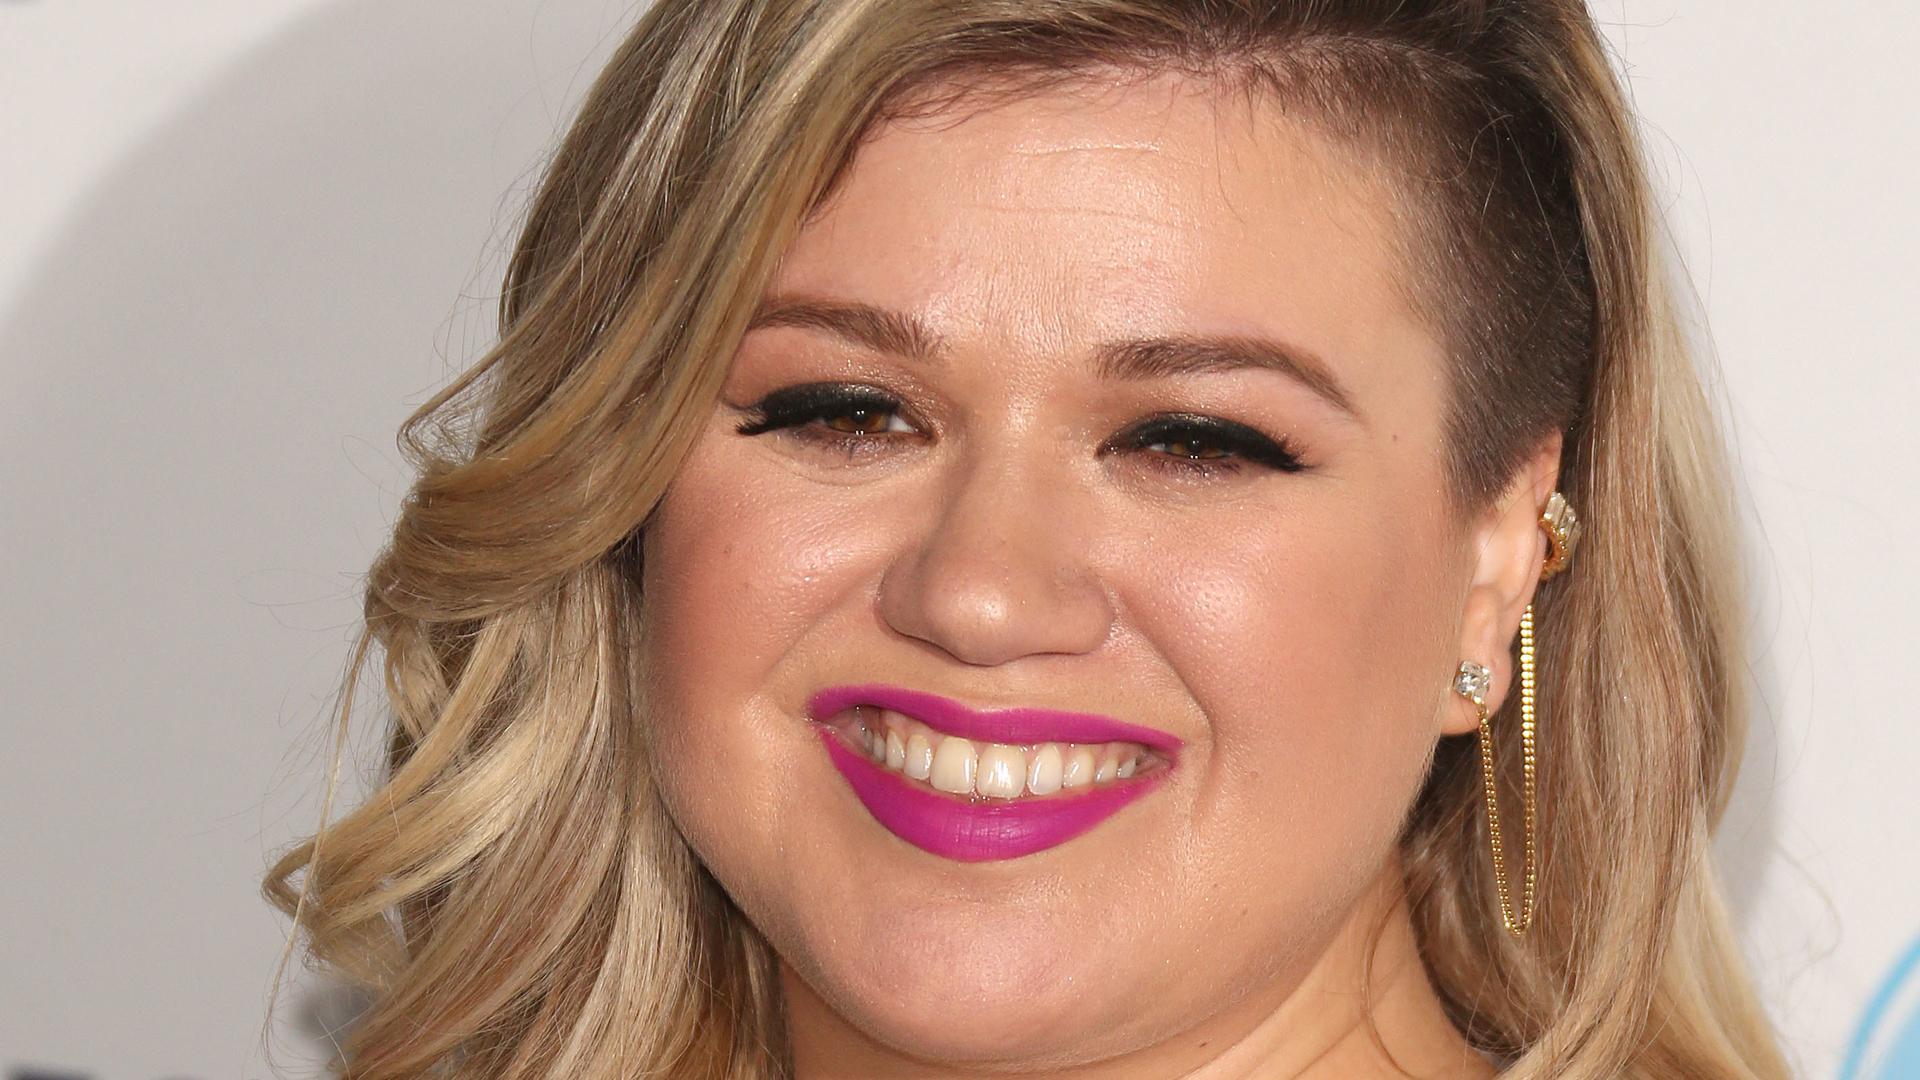 Kelly Clarkson Widescreen